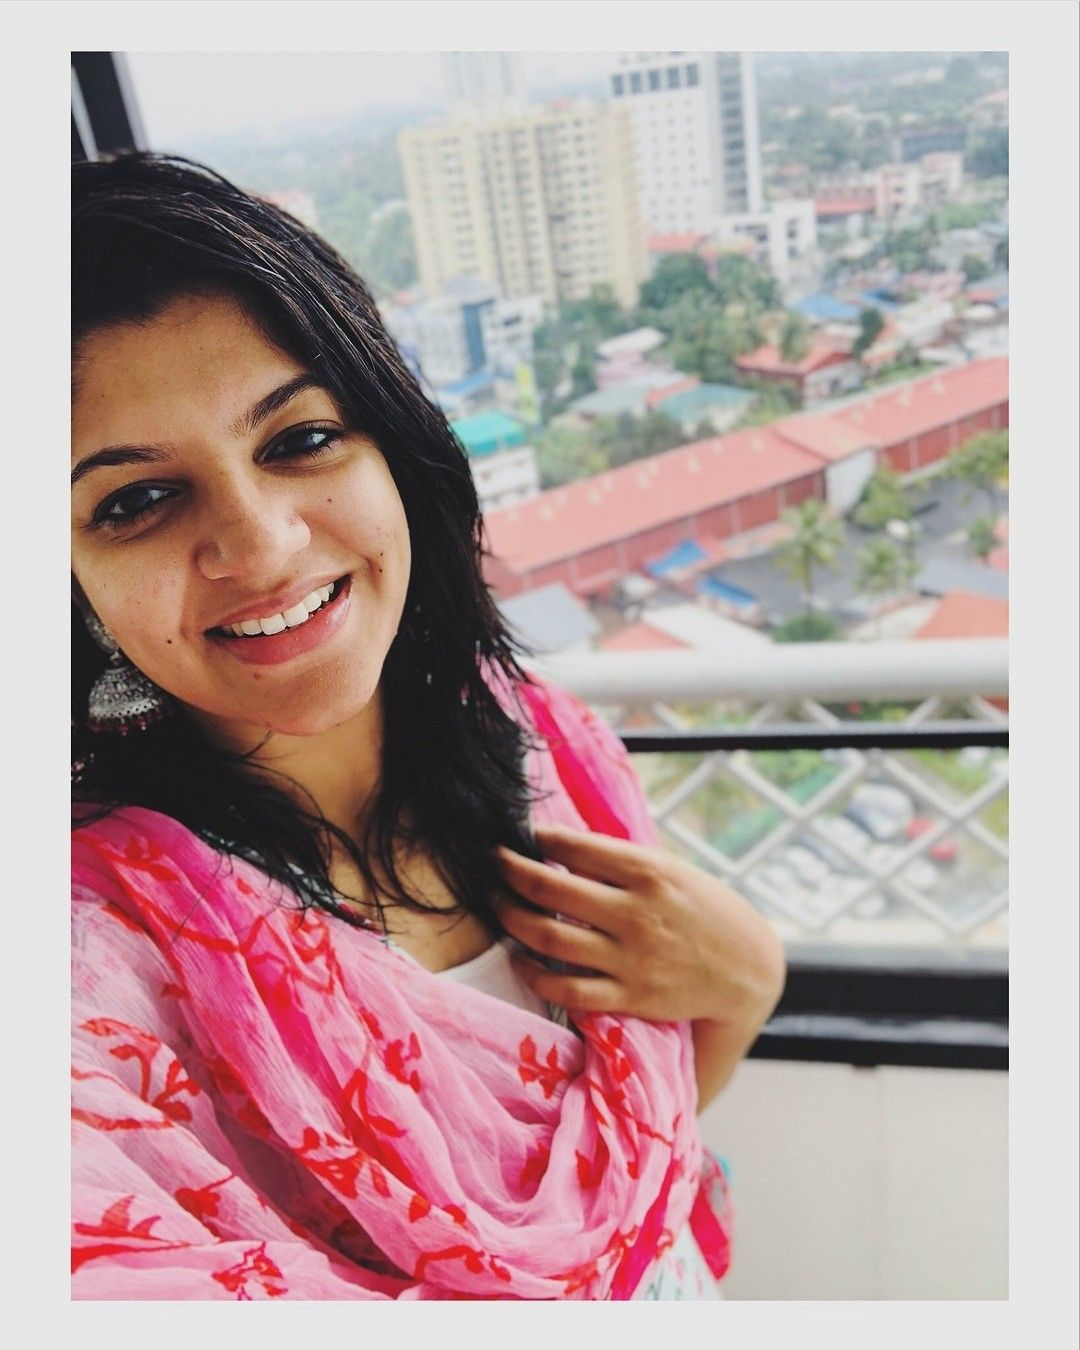 Pin on Aparna Balamurali Latest HD Photos/Wallpapers (1080p)